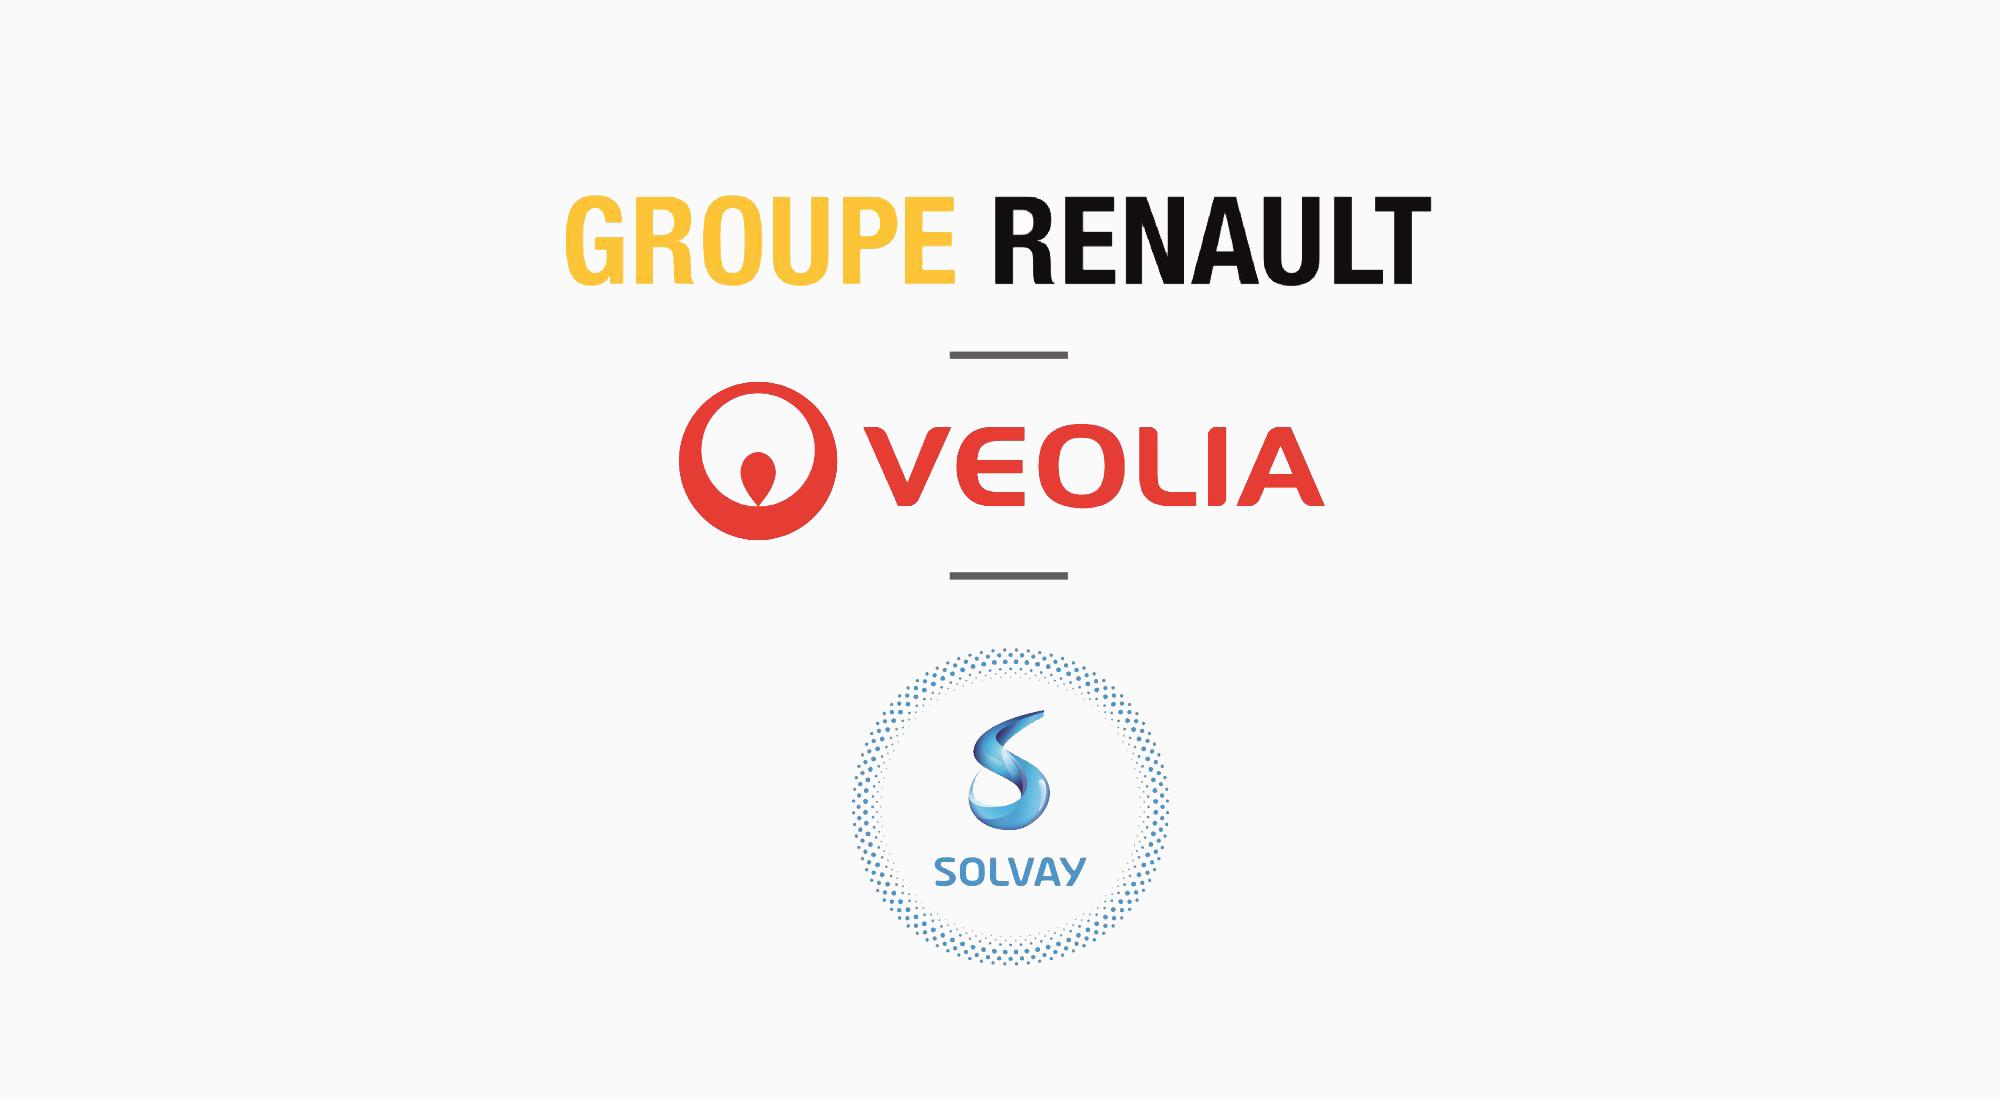 groupe renault veolia solvay